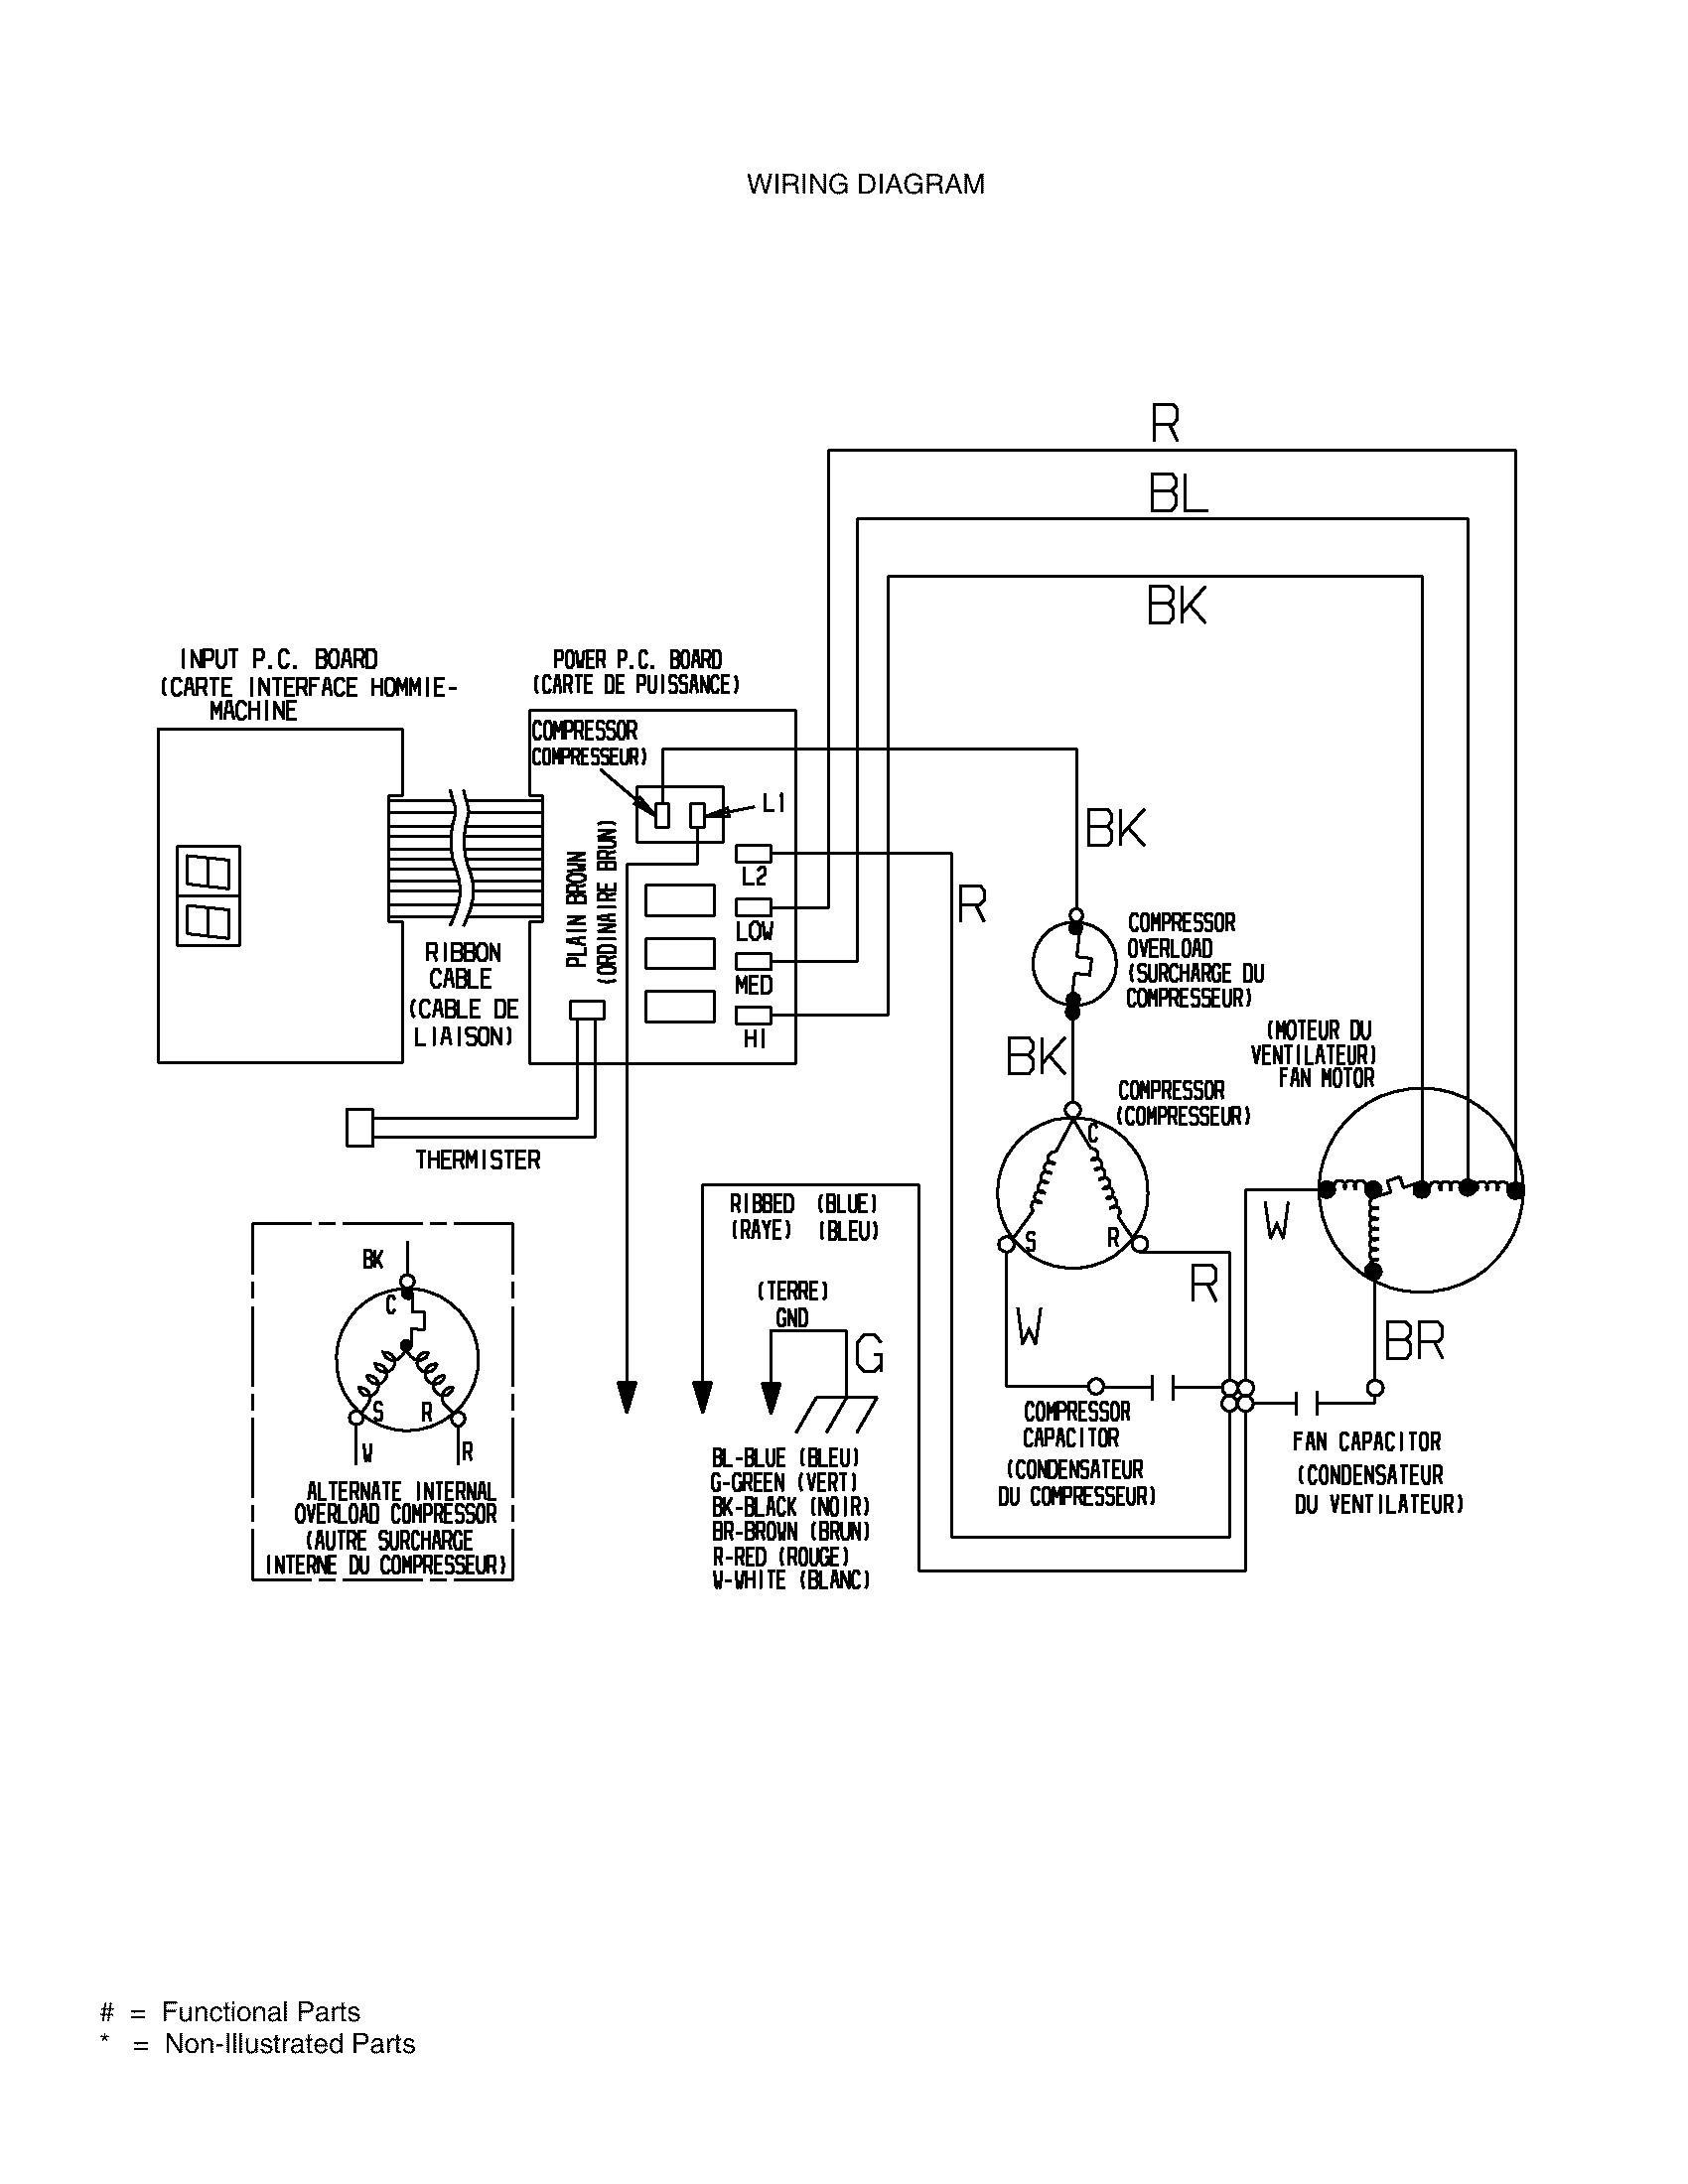 sew motor wiring diagram. Black Bedroom Furniture Sets. Home Design Ideas